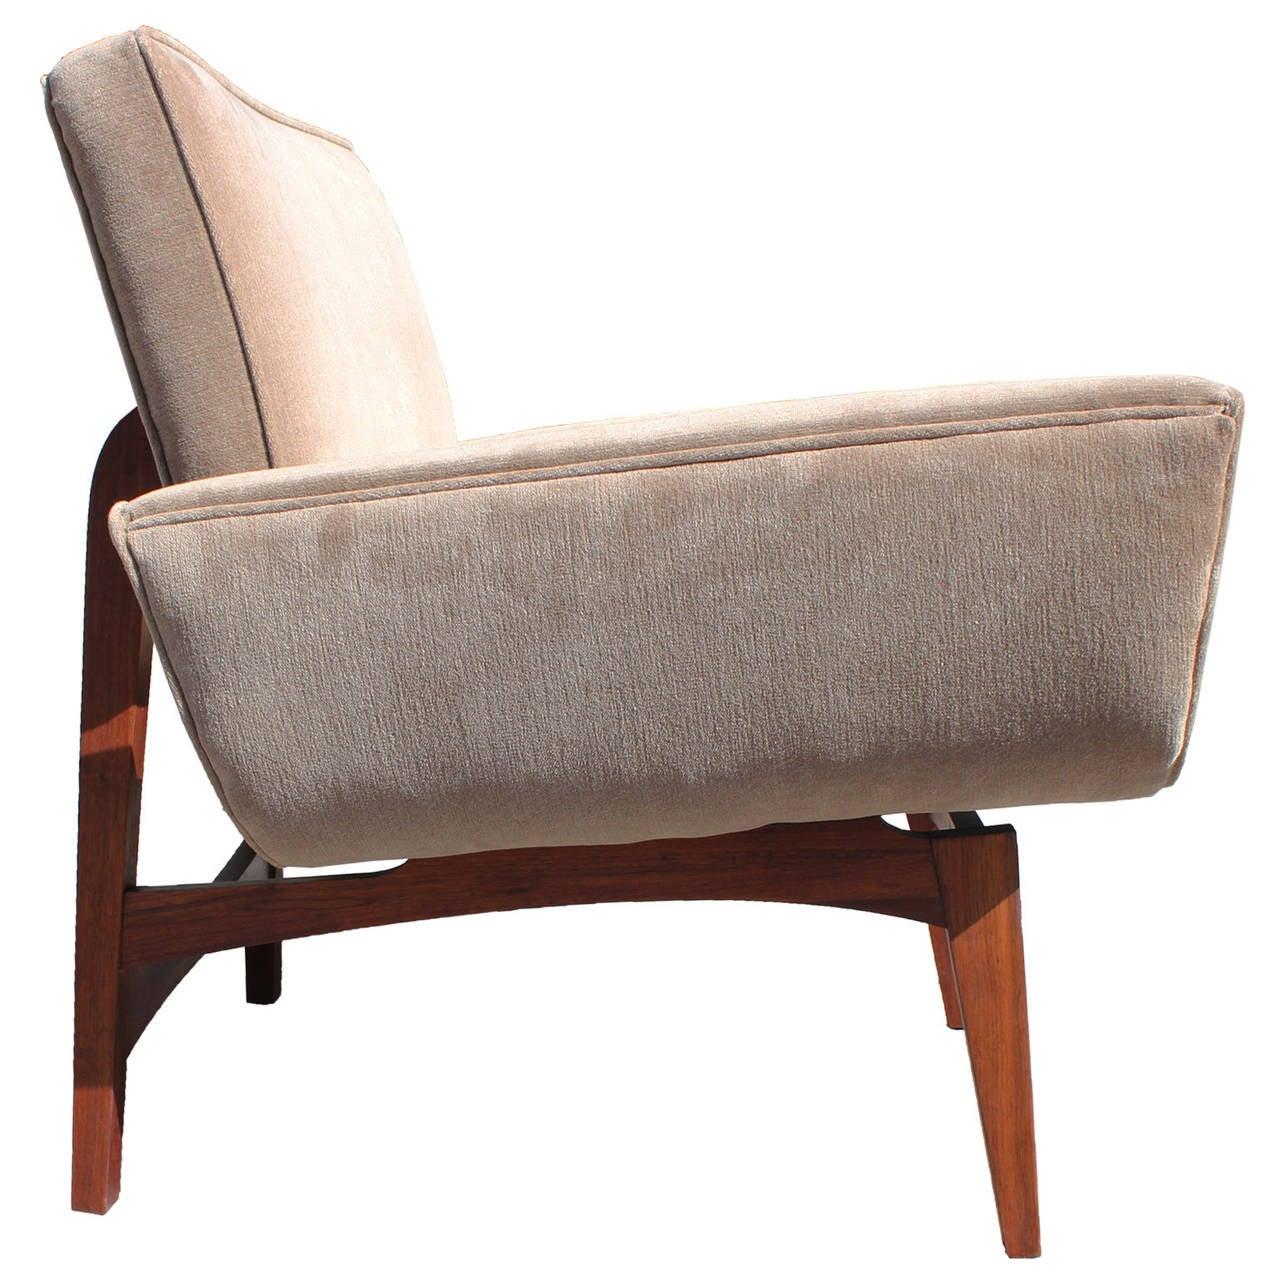 Stunning Sculptural Gondola Lounge Chairs At 1stdibs